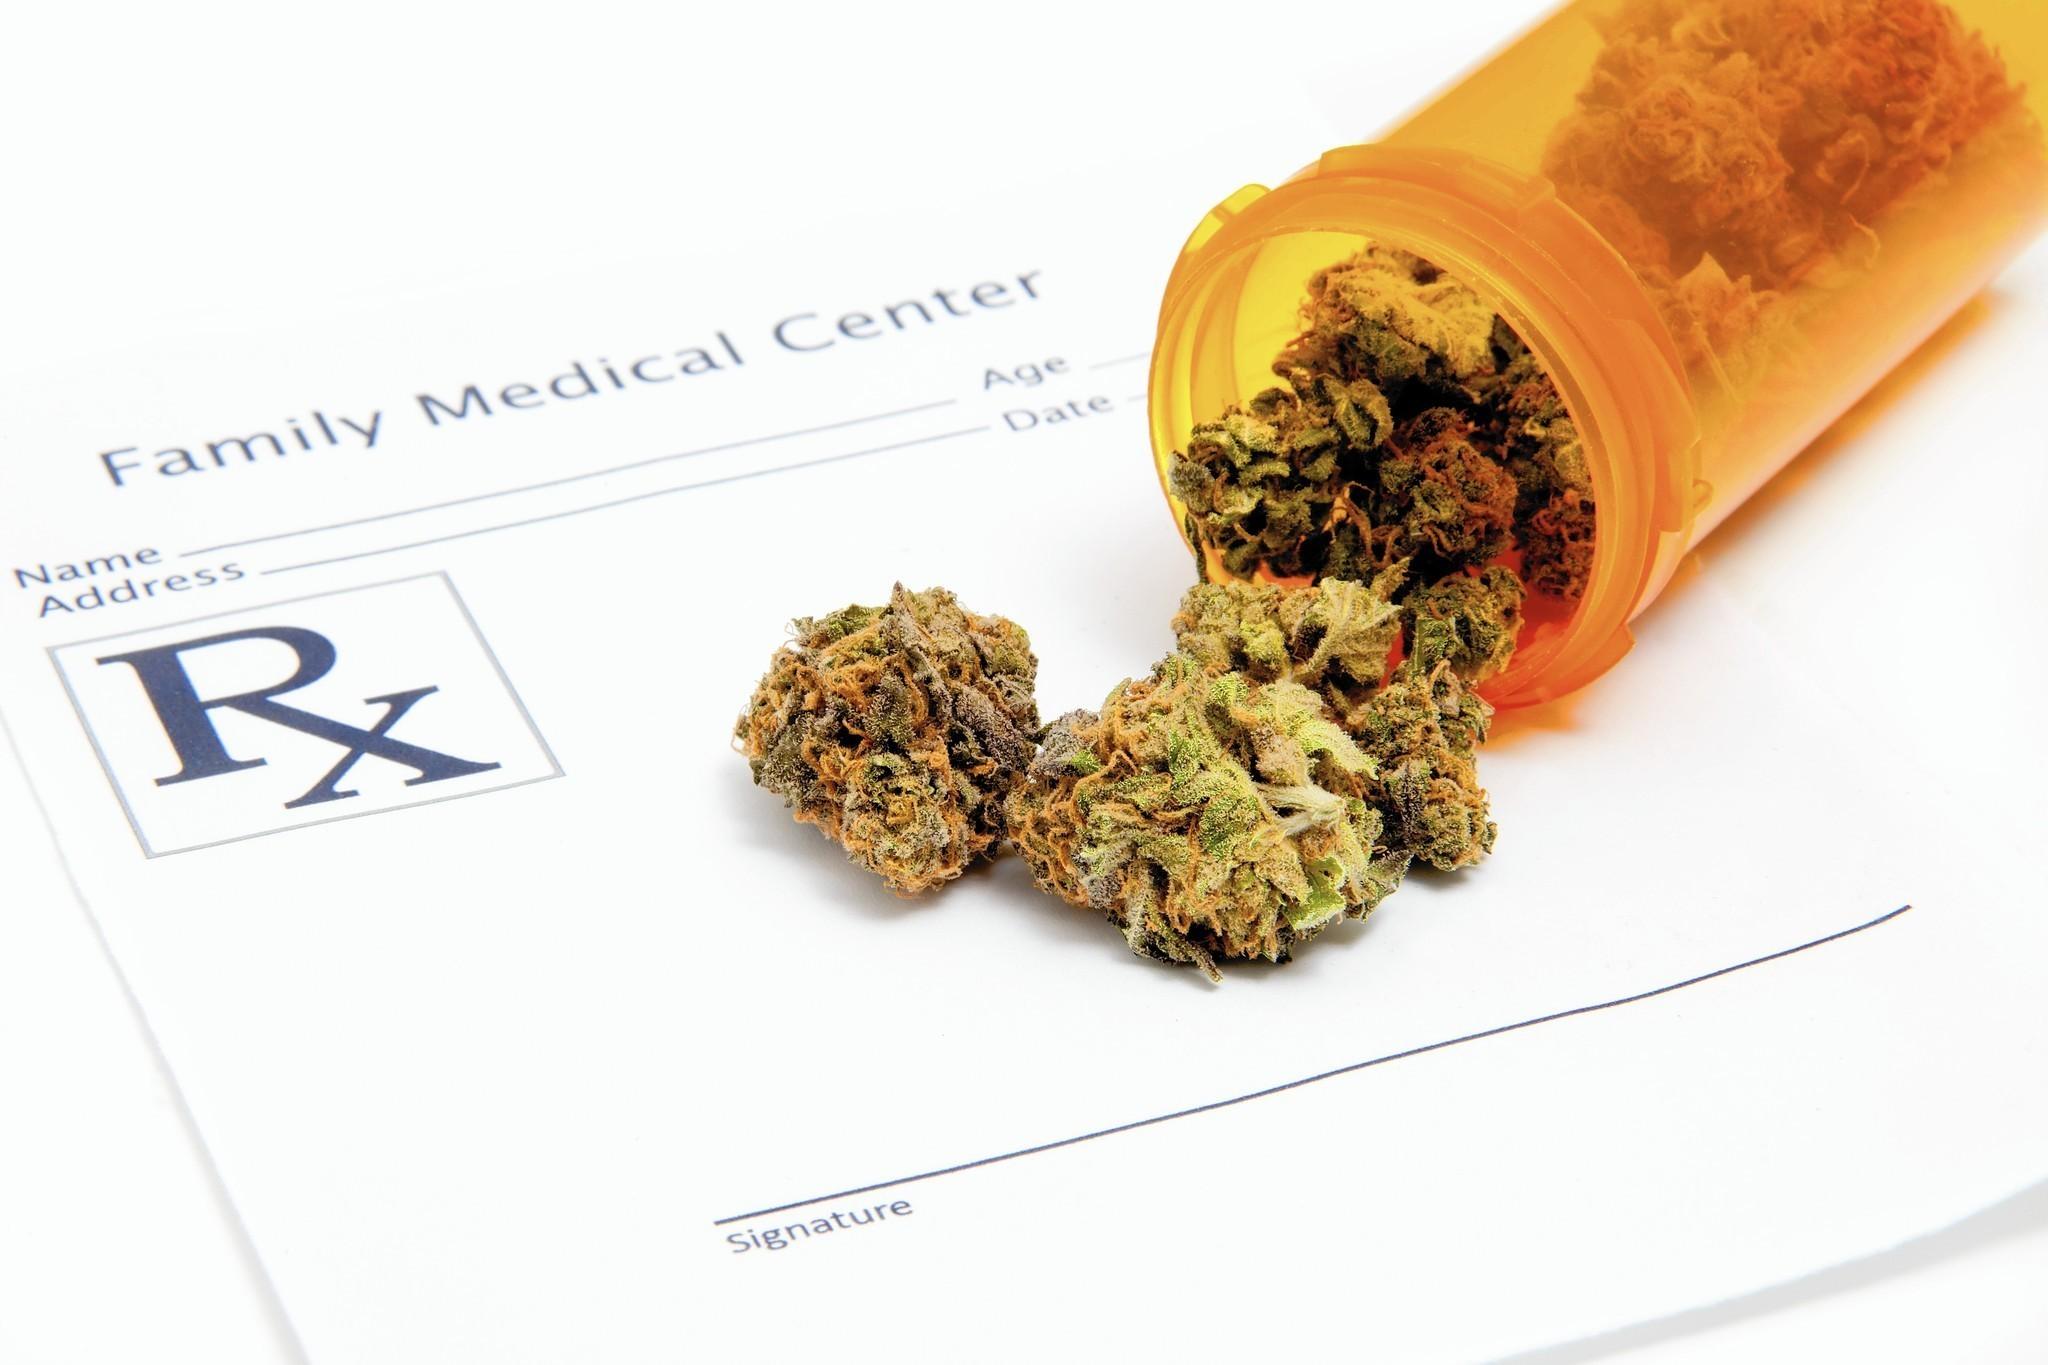 winter garden to consider temporary hold on medical marijuana